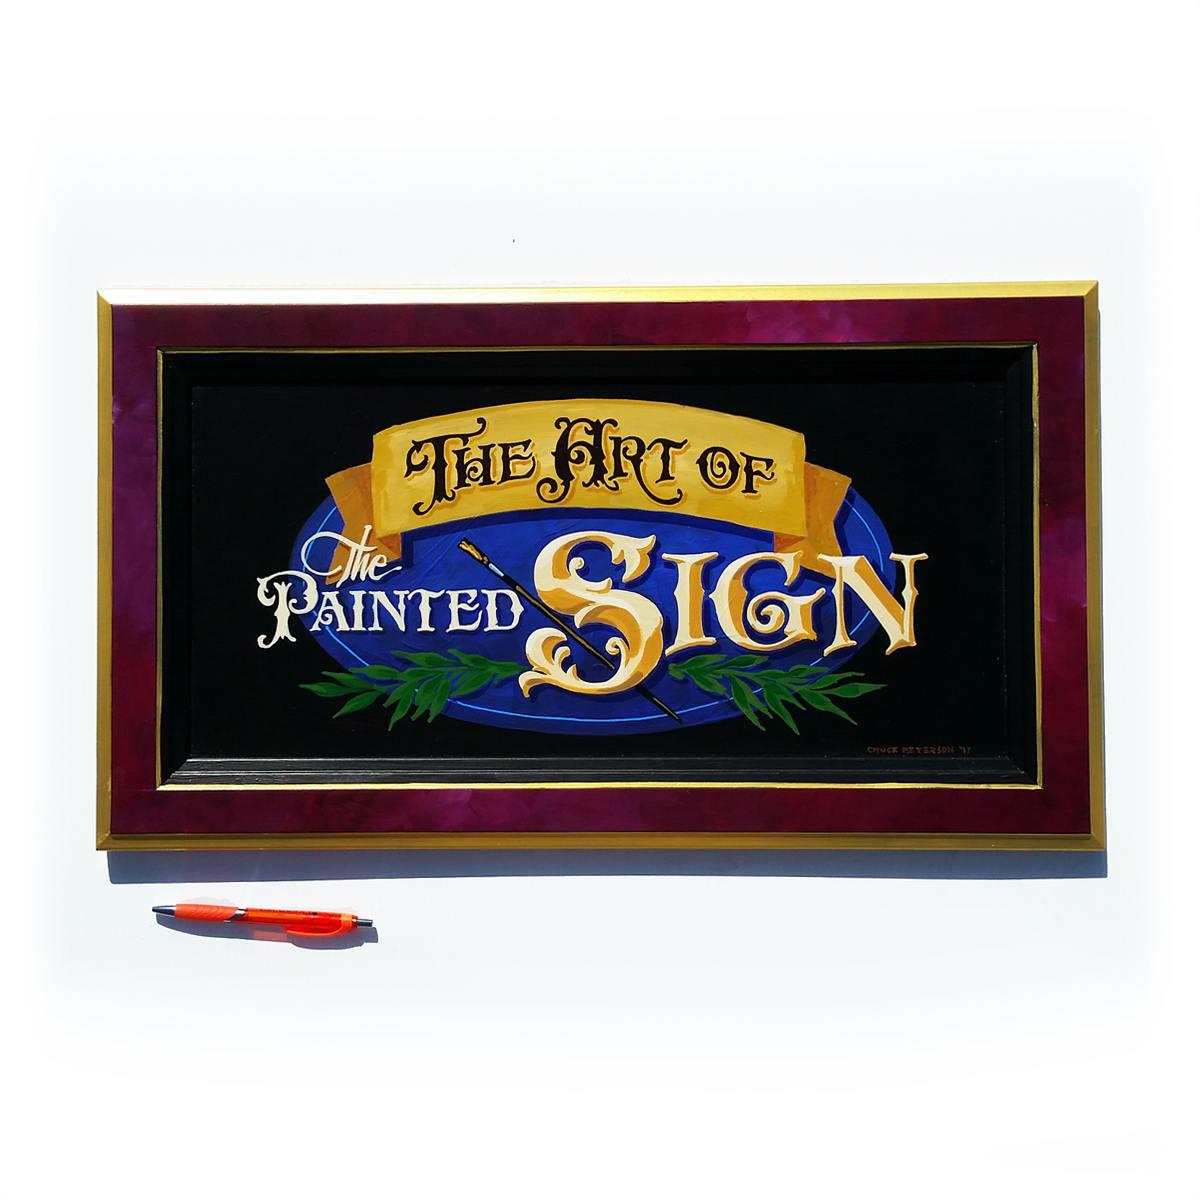 Painted sign art.jpg